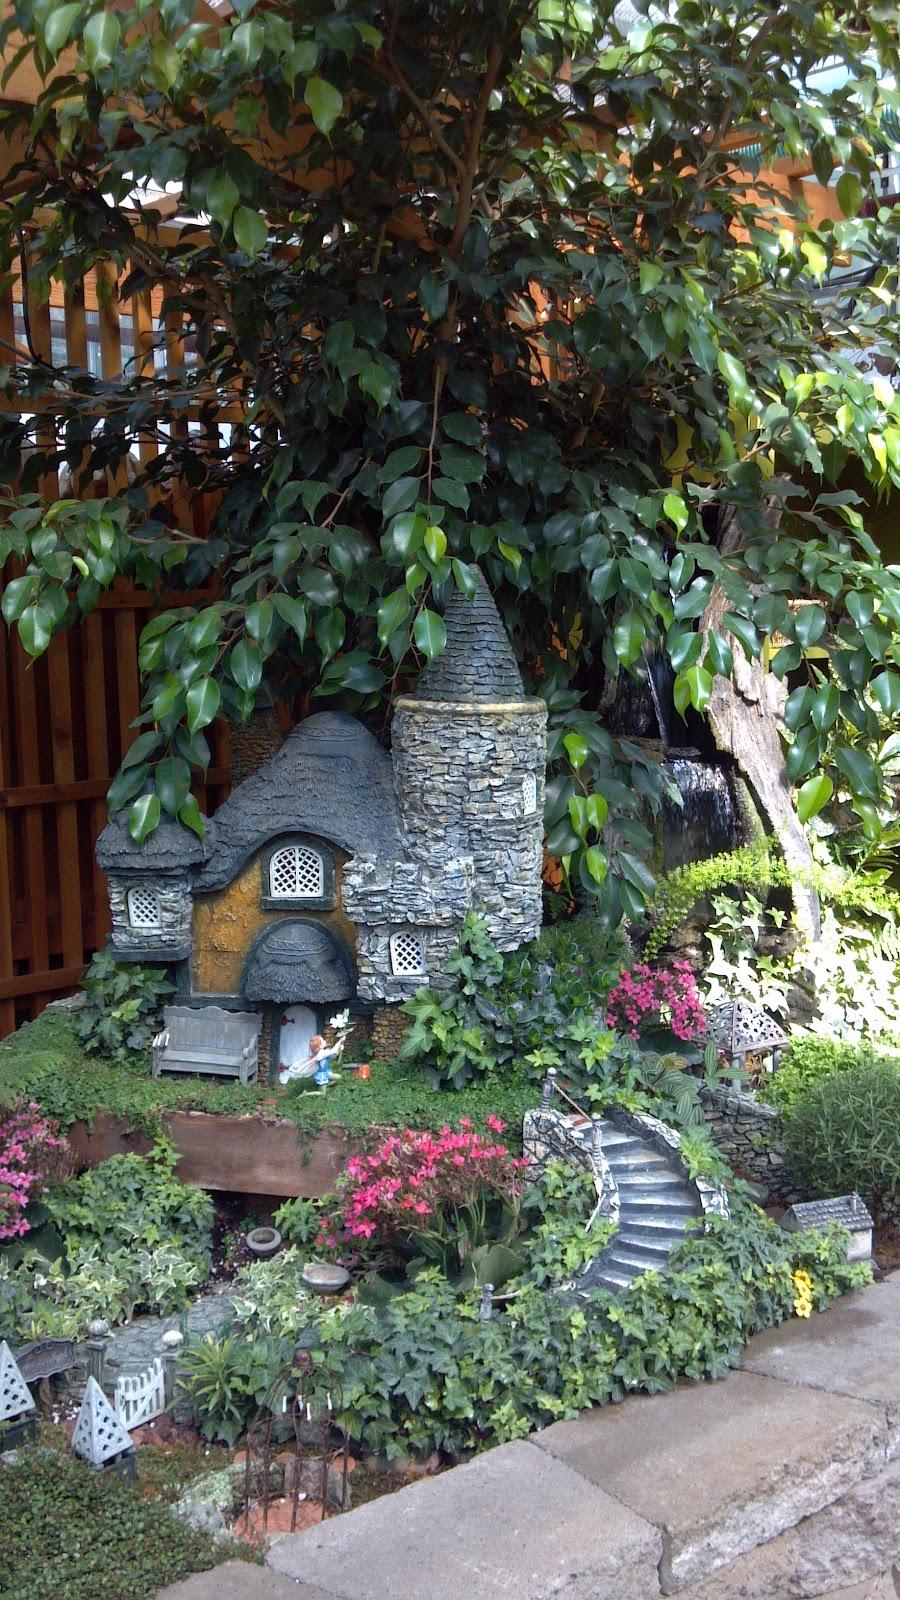 Garden Centre: I Love My Garden: I Found A Great Garden Center